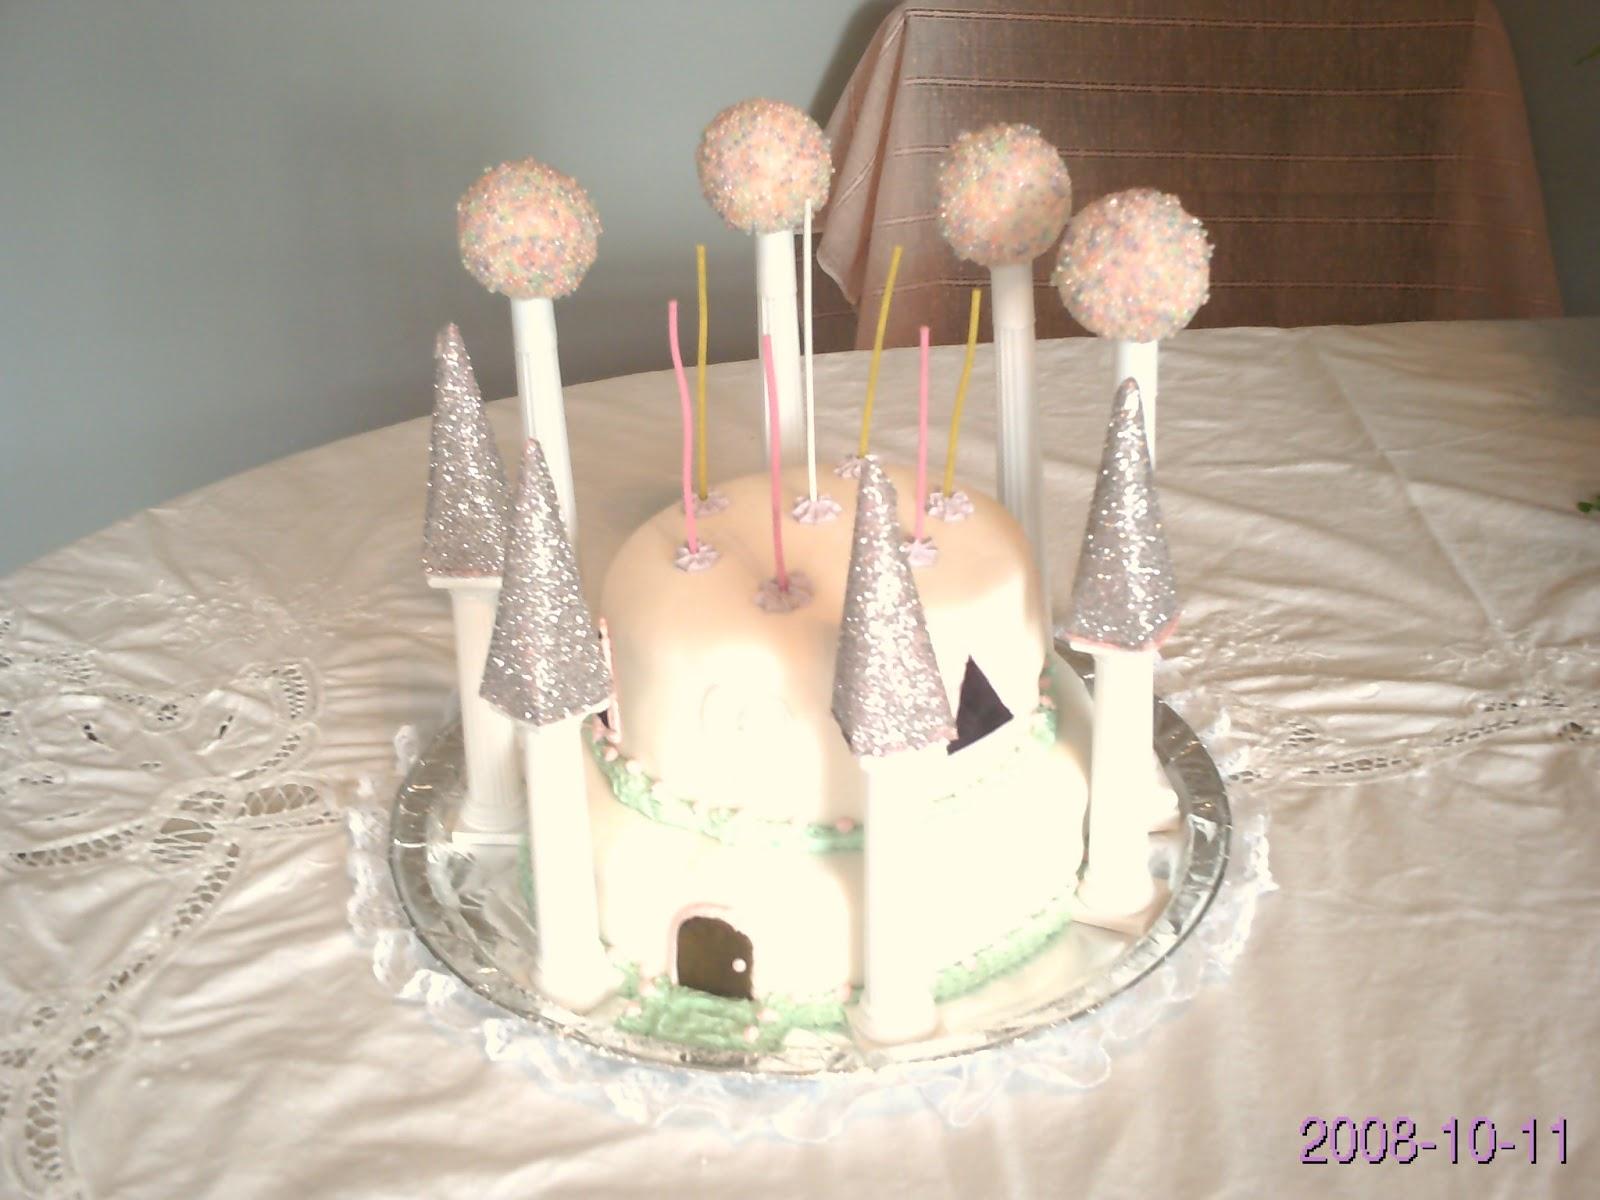 Cake Decorating Foam Balls : Family Kreationz: Ladybug s 7th Birthday Cake